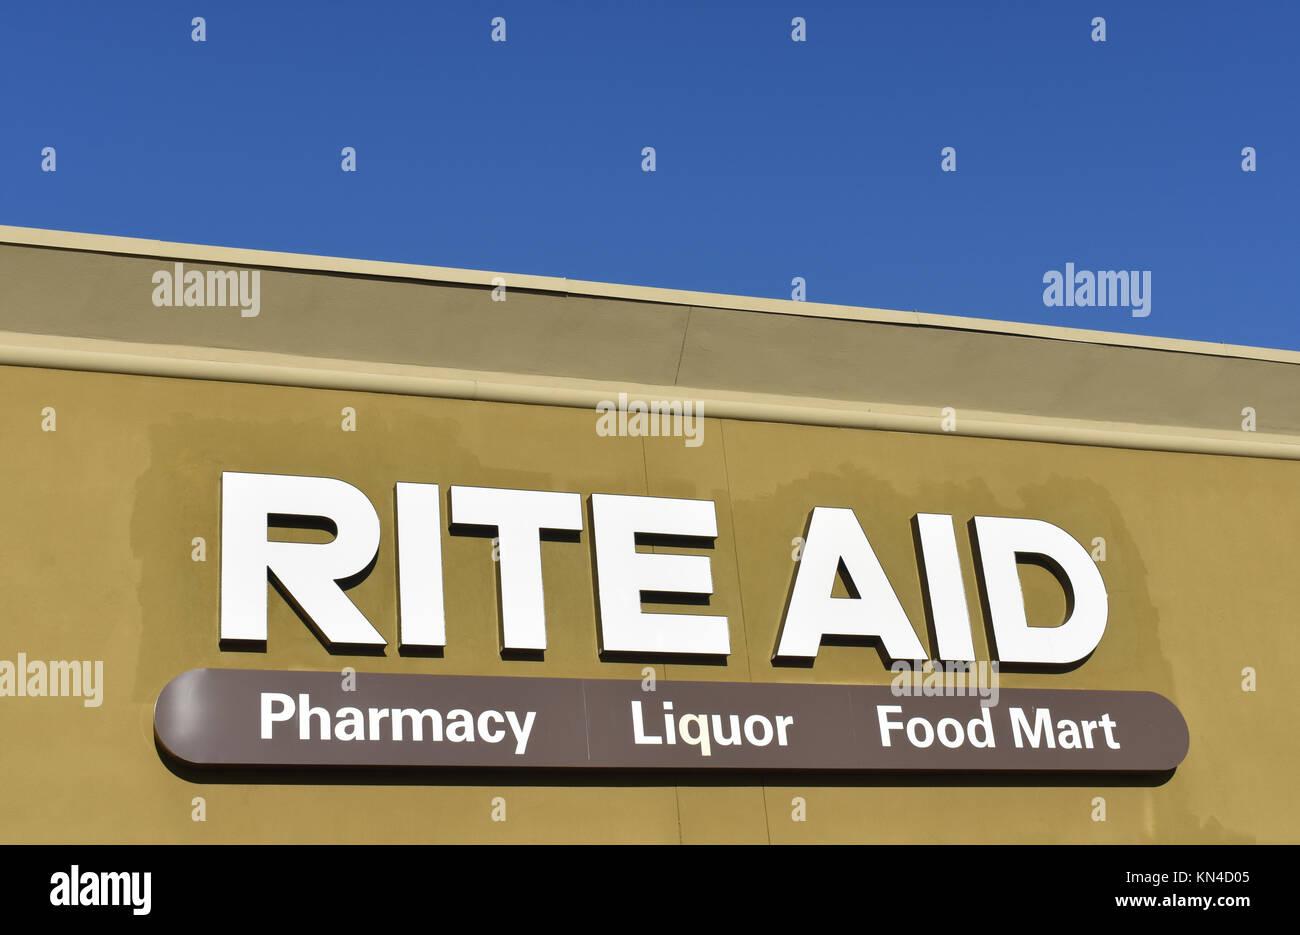 Rite Aid pharmacy, liquor and food mart in Bellingham, Washington, USA. - Stock Image